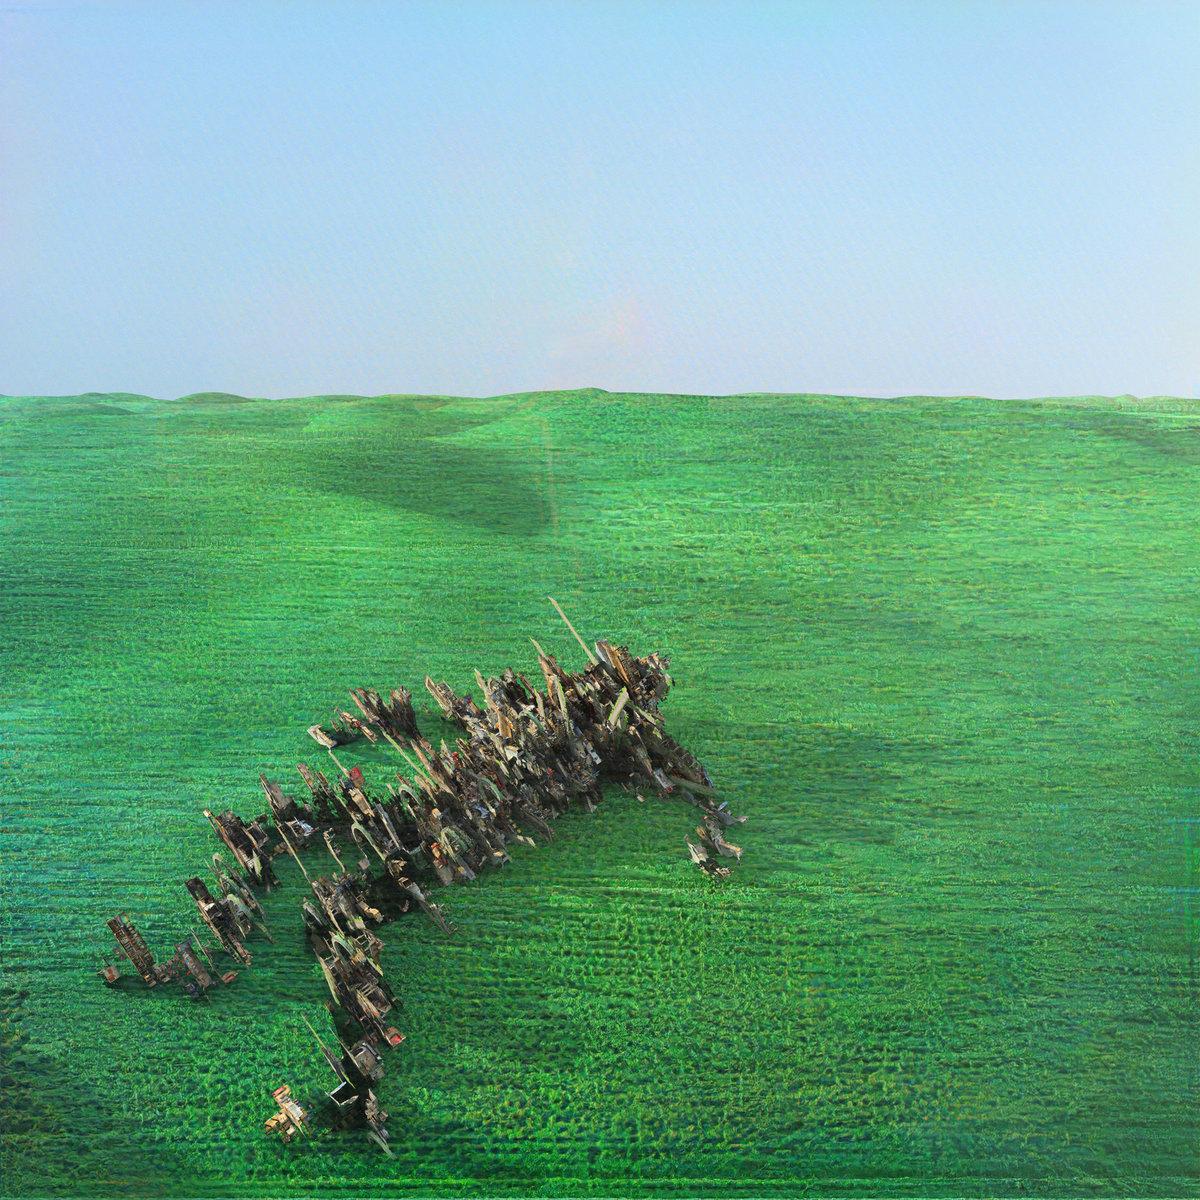 Squid - Bright Green Field (Warp Records / Rough Trade, 2021)